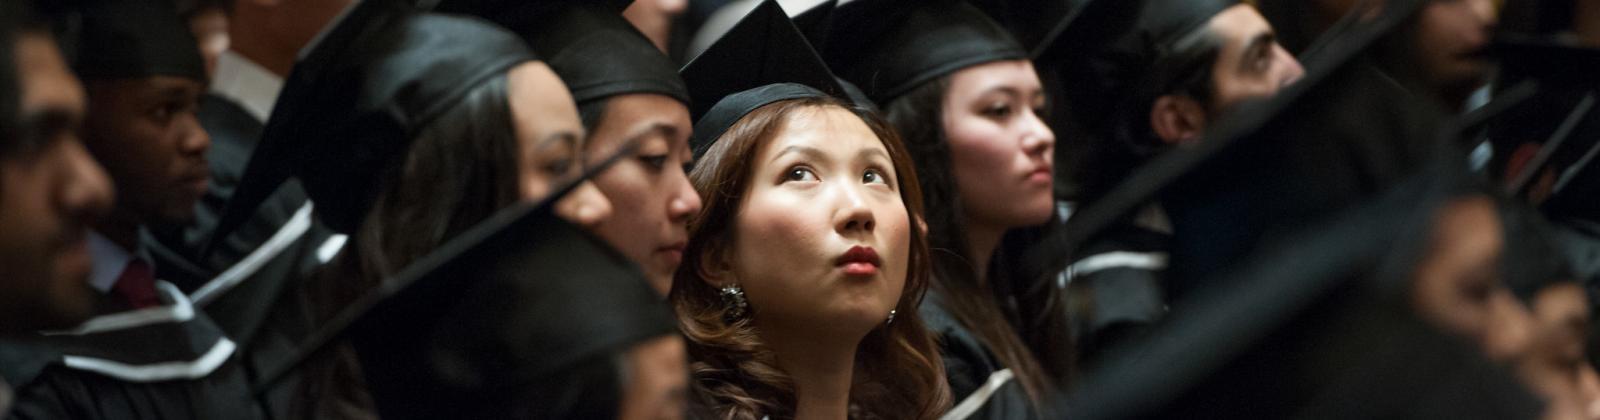 student at grad ceremony